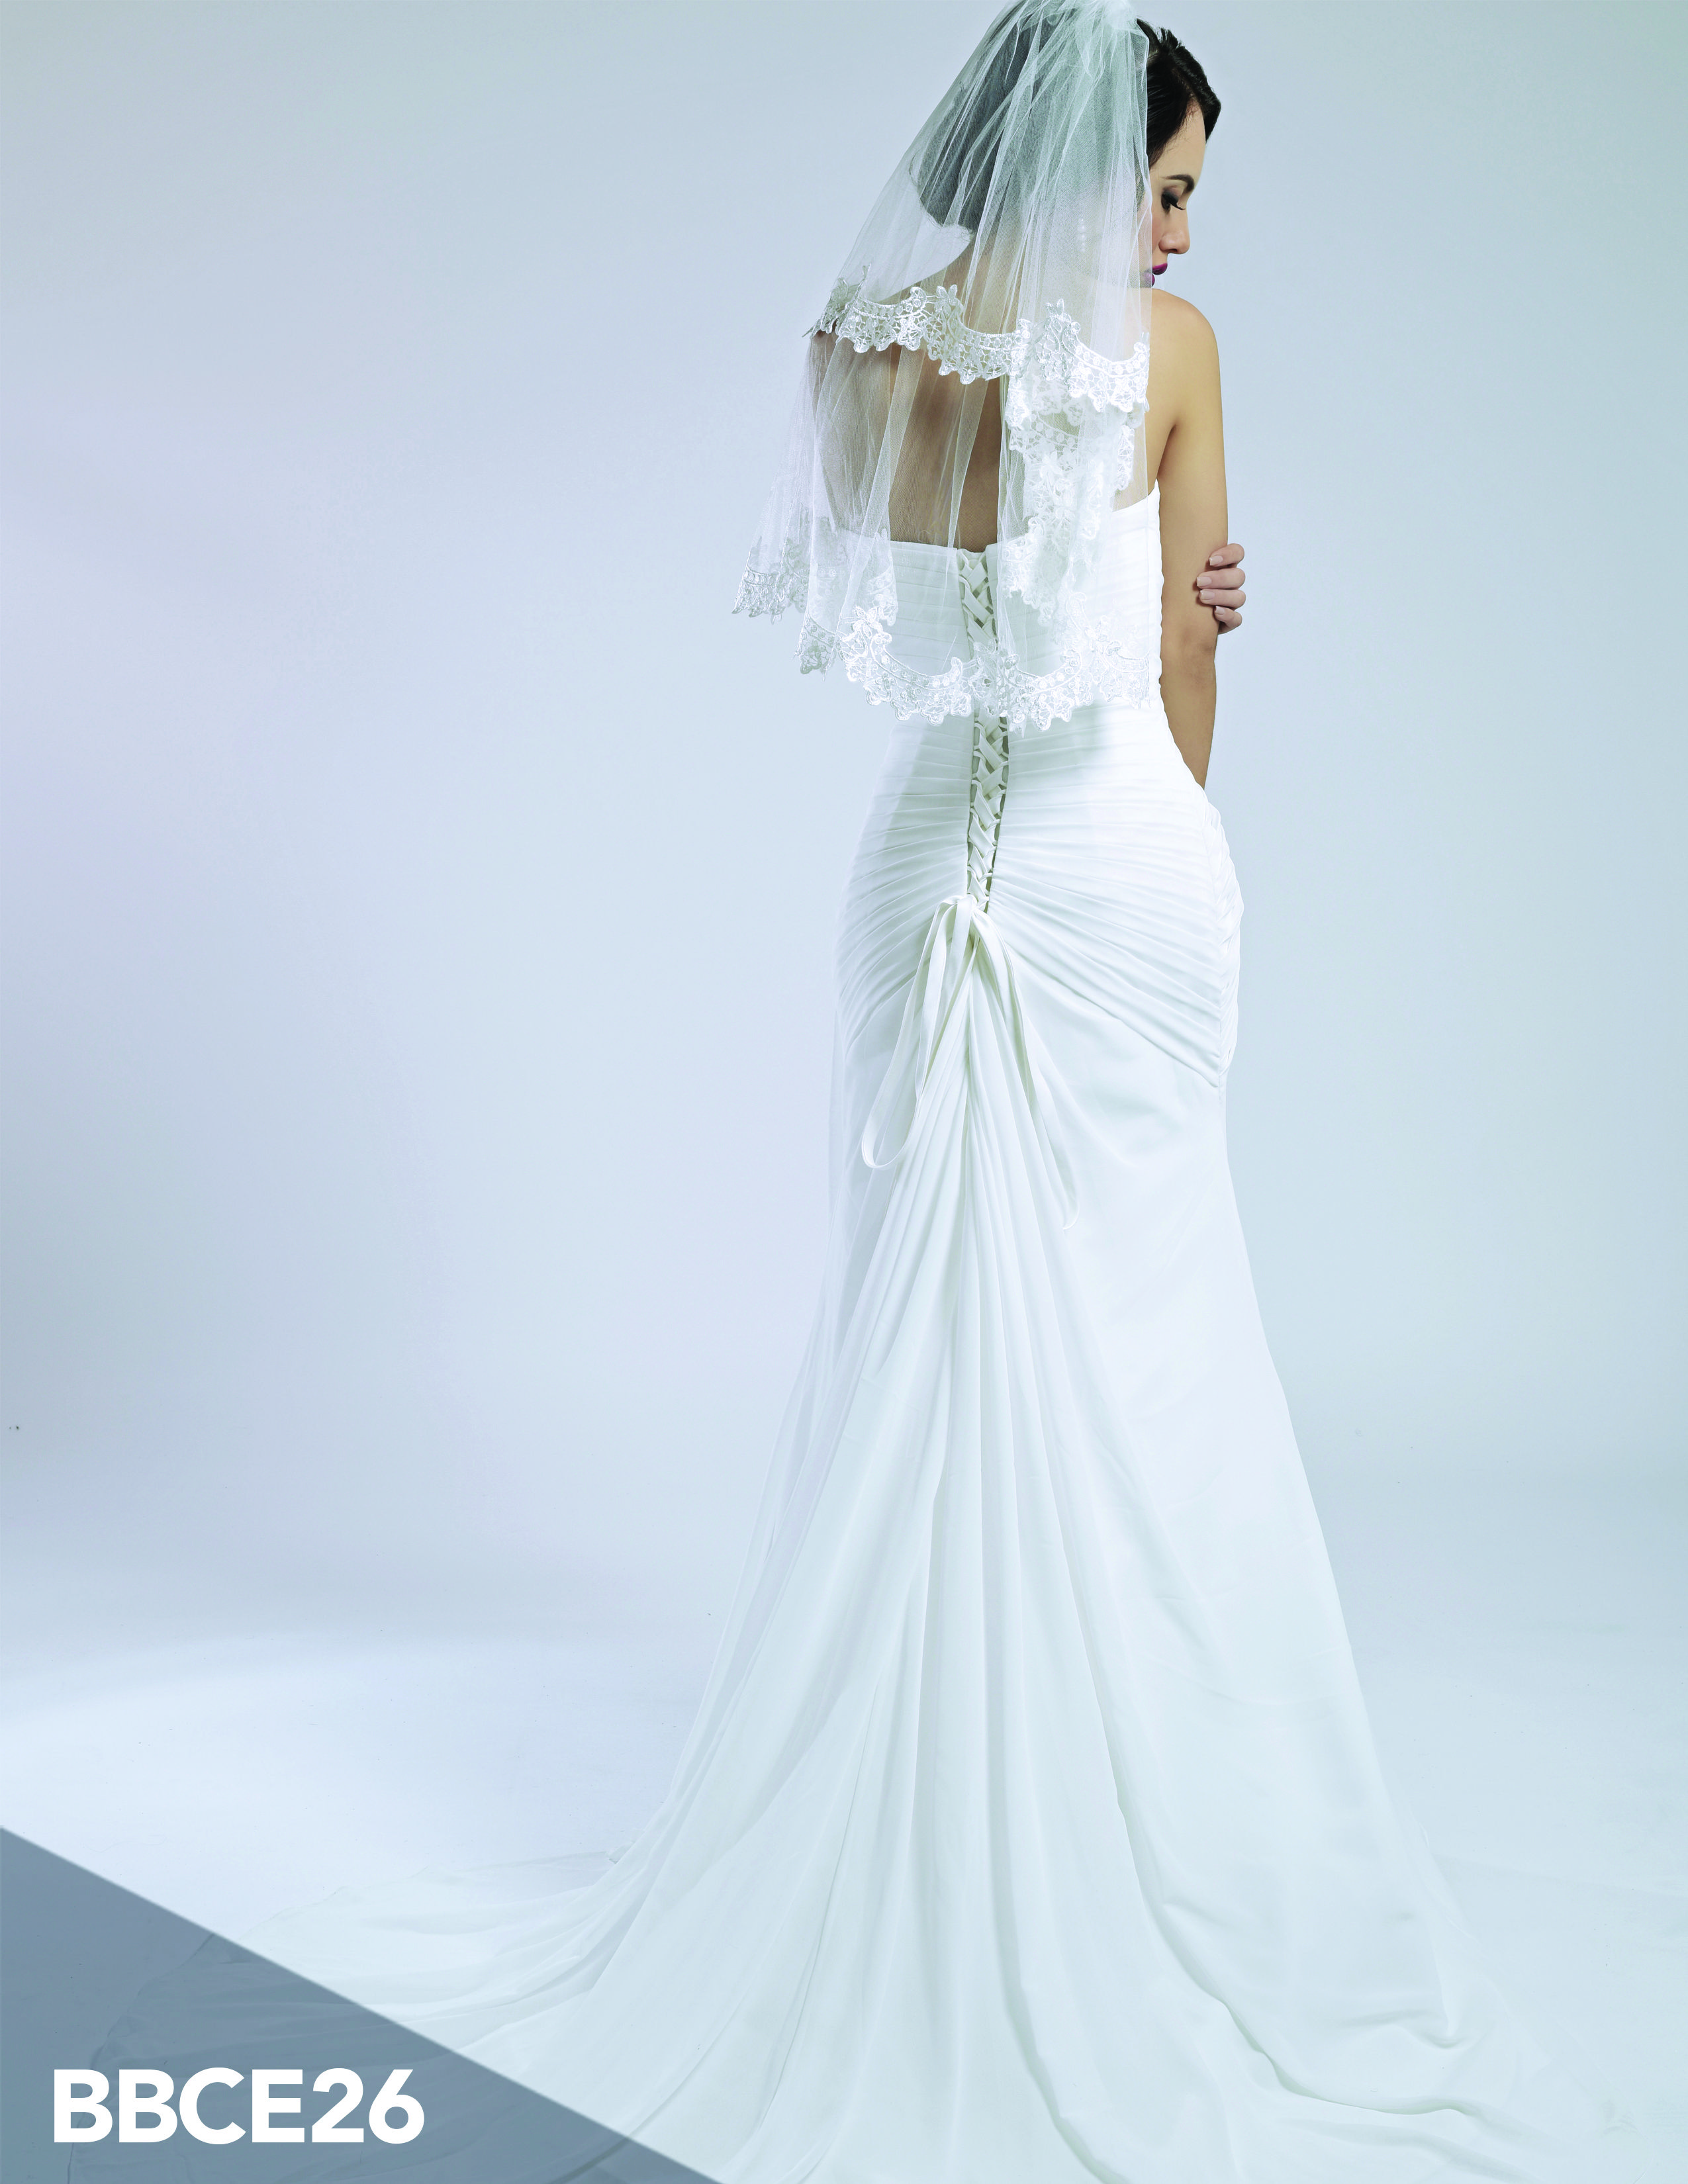 Beautiful #Bride #Wedding #couple #bridal #dress #bridedress ...